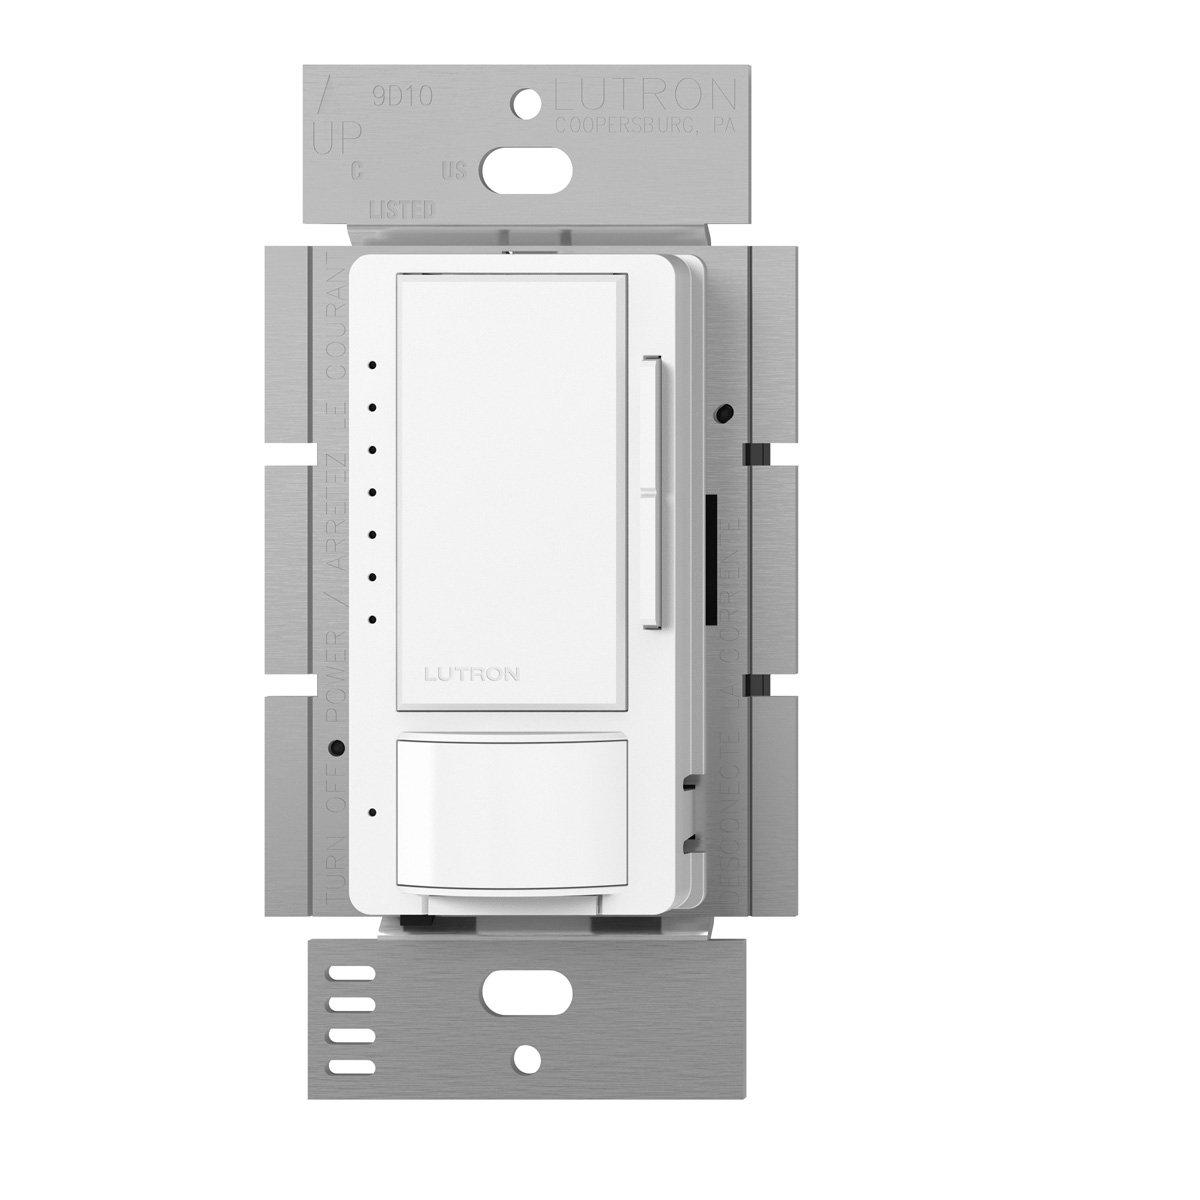 Lutron MSCL-VP153M-SW Maestro CL Single Pole Multi Location Vacancy Sensing Dimmer, Snow by Lutron B00FQL2HM2 スノー スノー